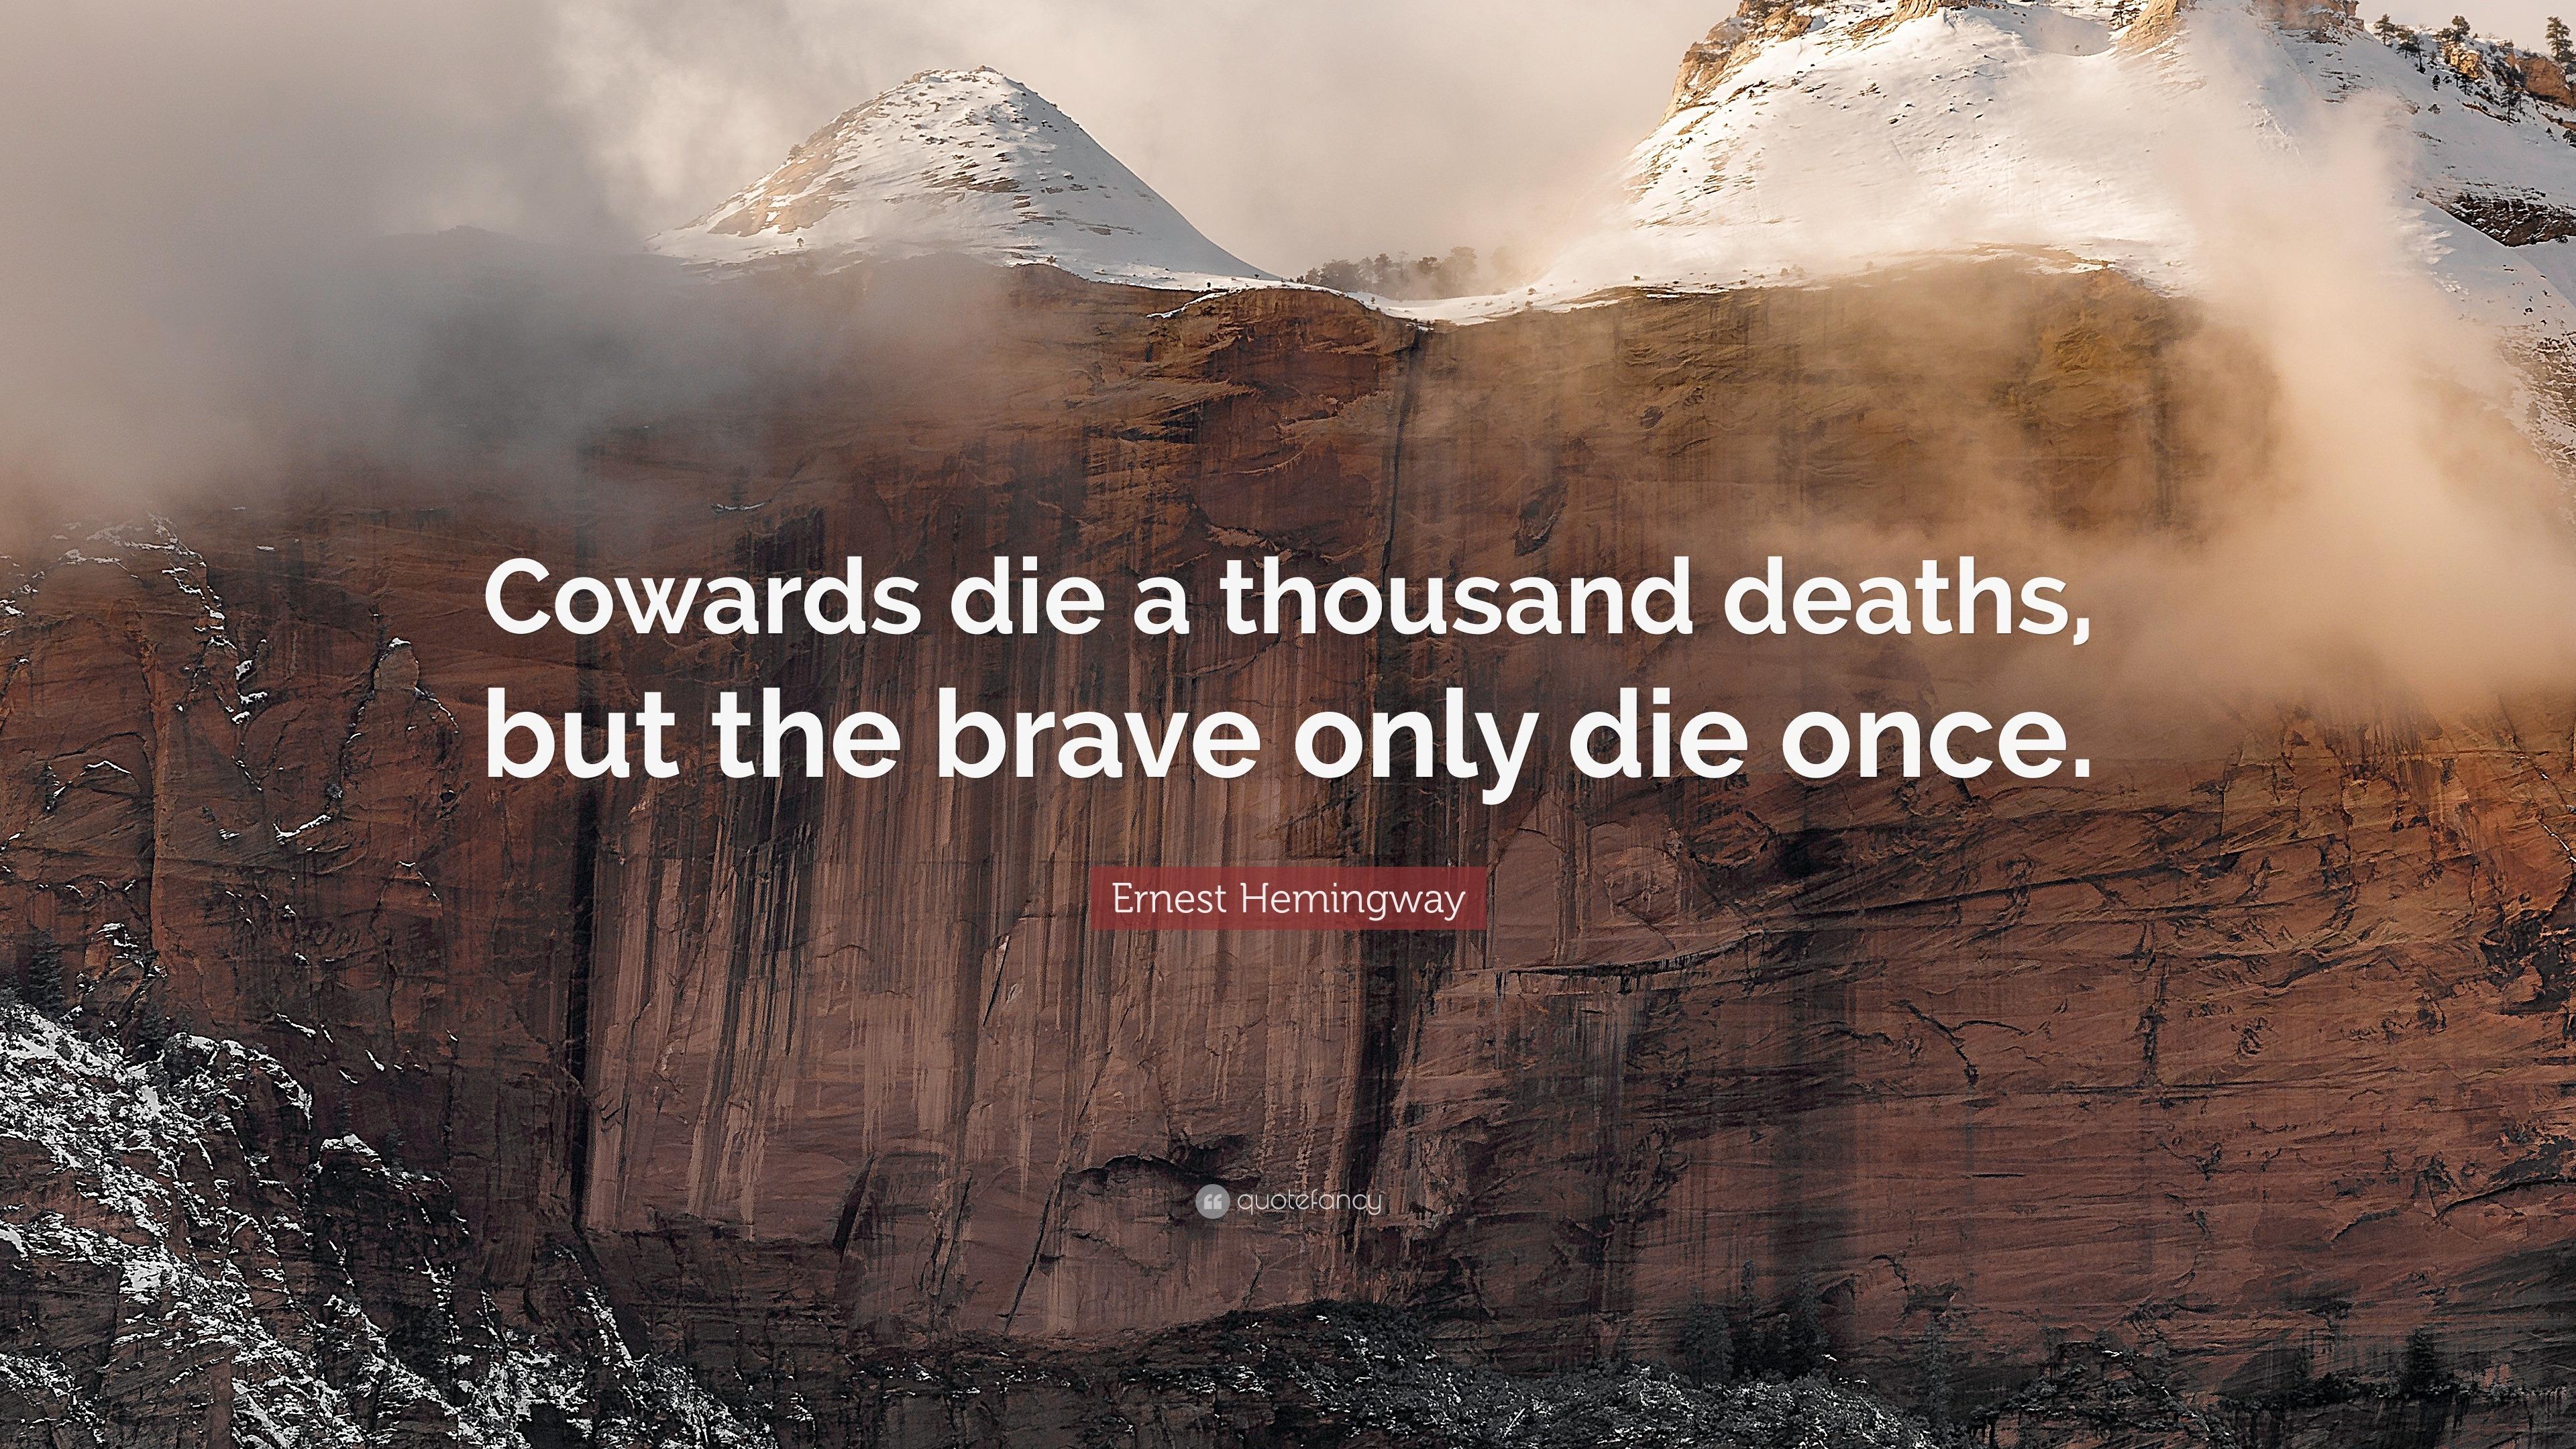 cowards die-off the million fatalities essay